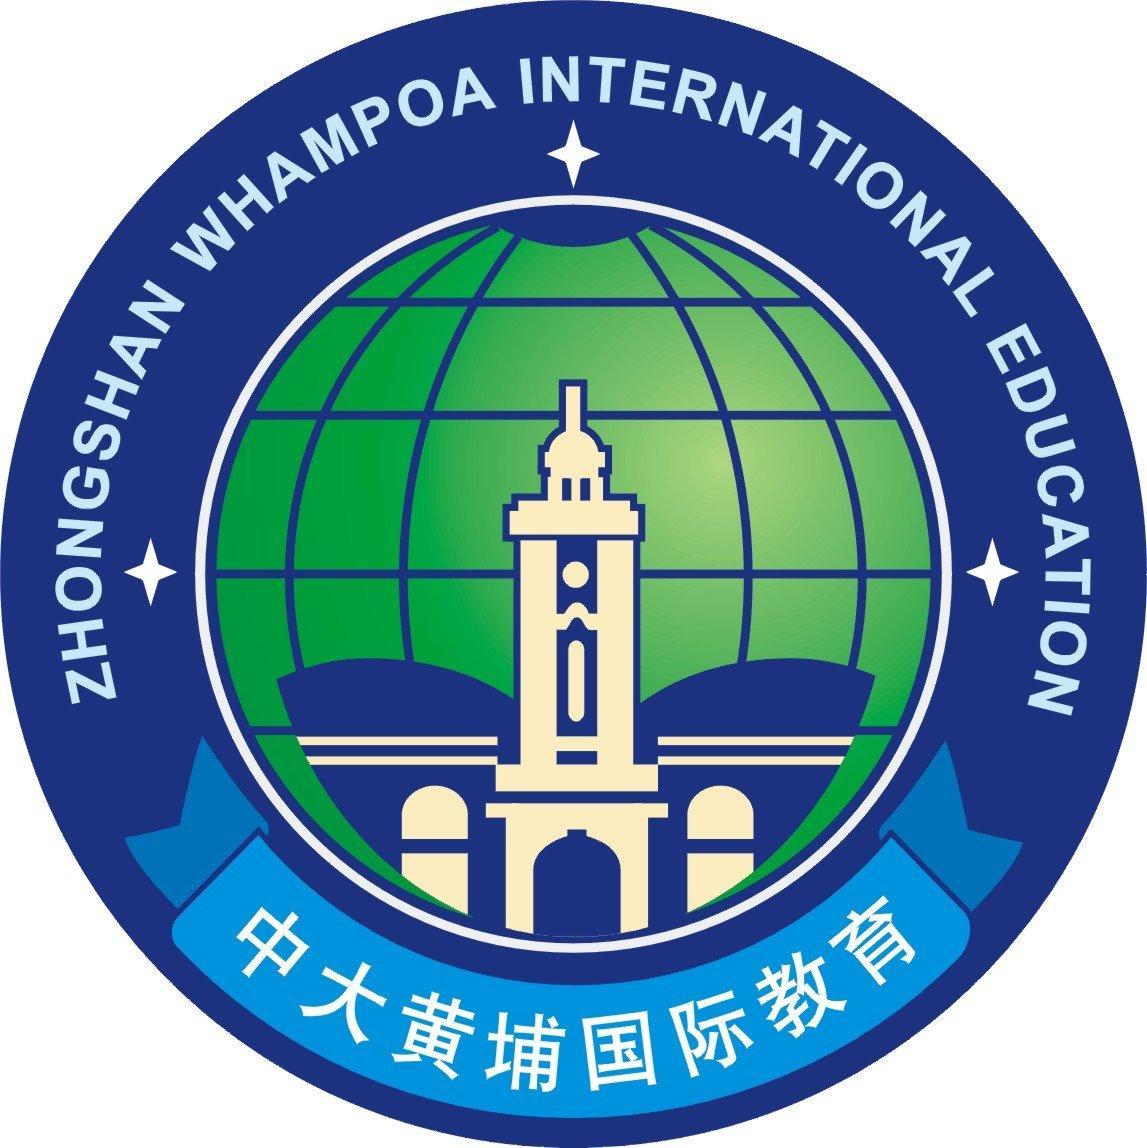 logo logo 标志 设计 图标 1147_1148